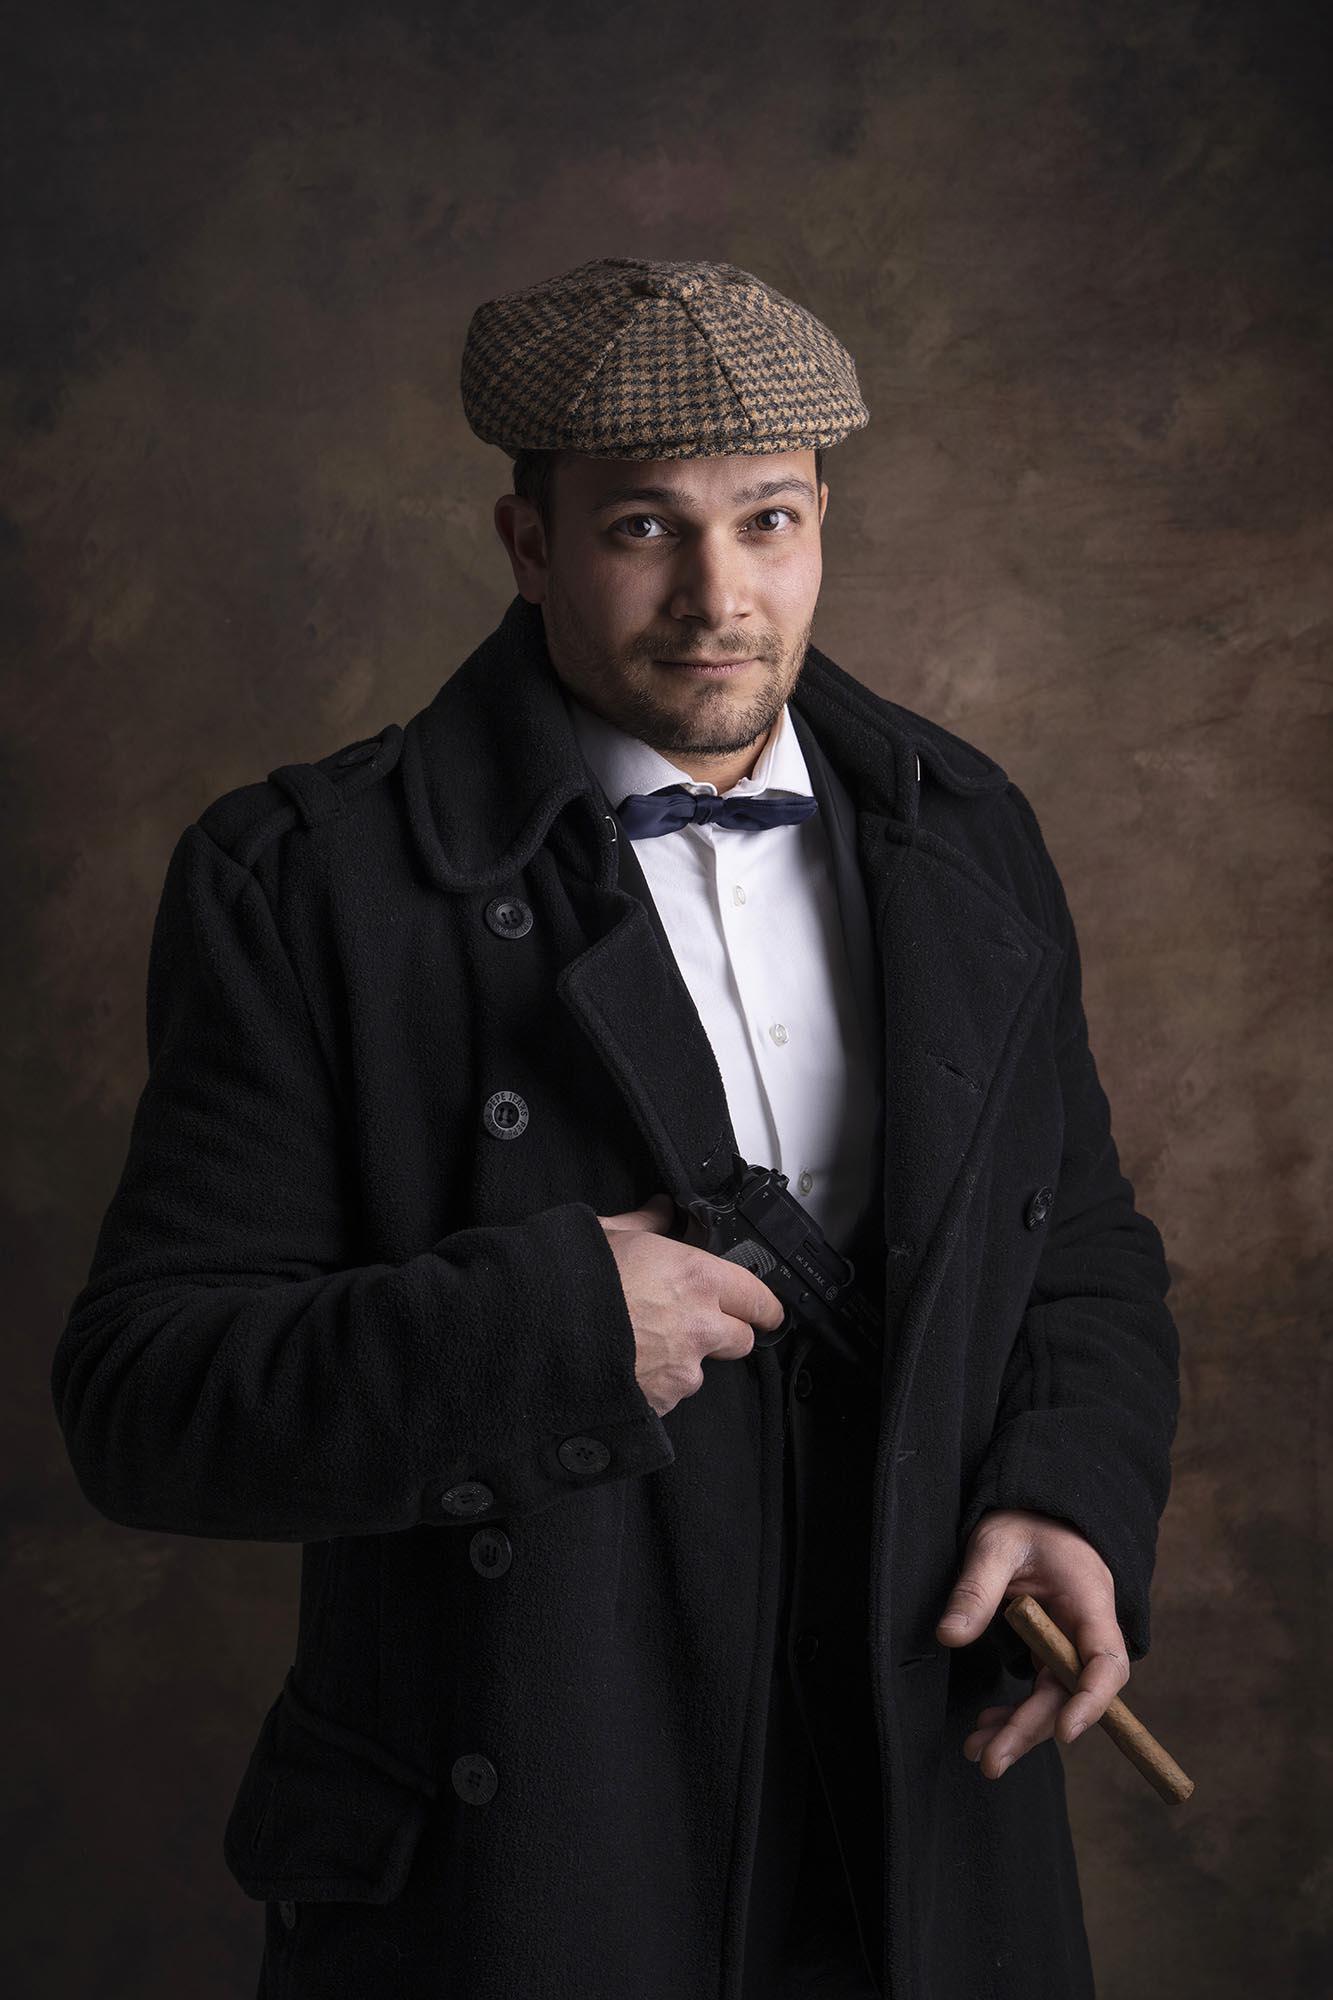 photographe-portrait-homme-inspiration-peaky-blinders-studio-stephanie-avon